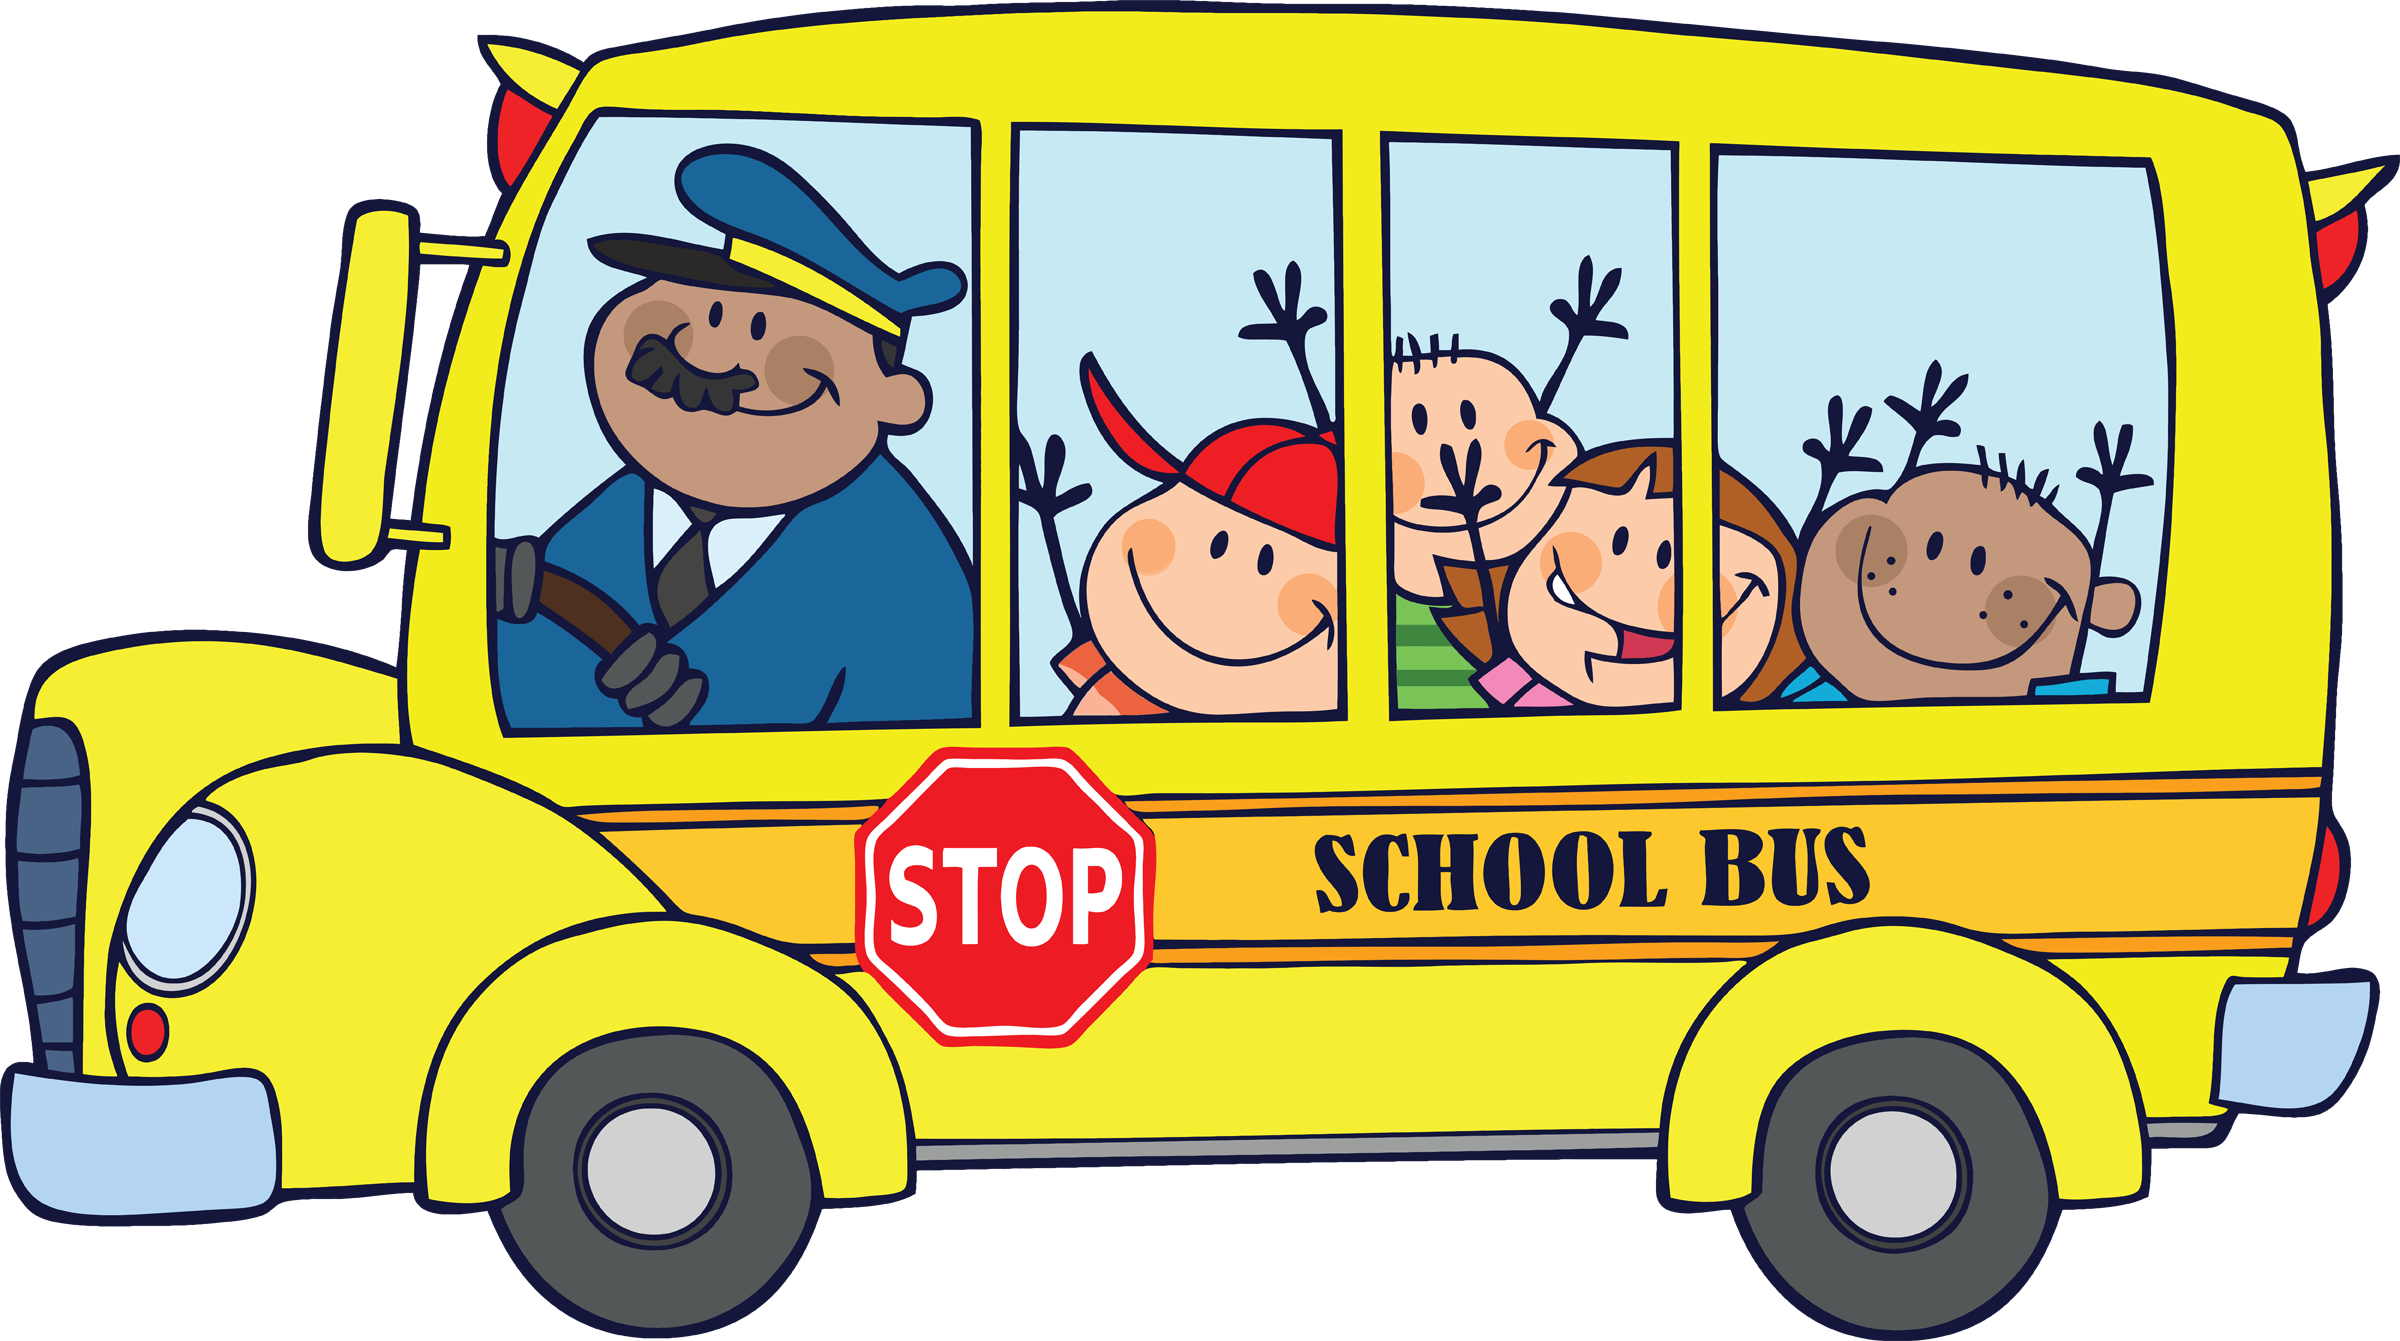 School bus clip art for kids free clipart images